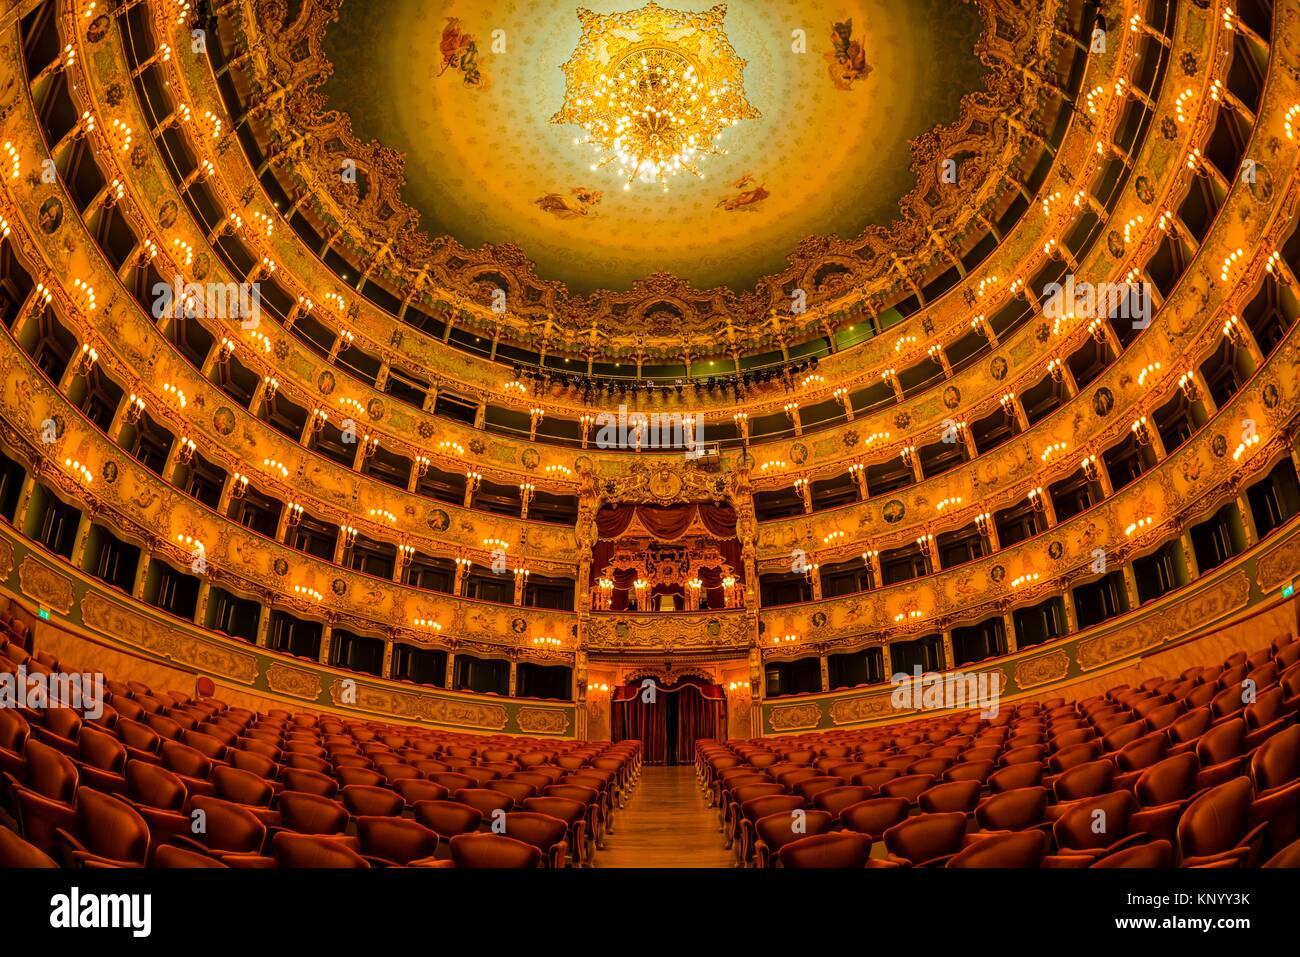 Teatro La Fenice (La Fenice Theater) opera house, Venice, Italy. - Stock Image